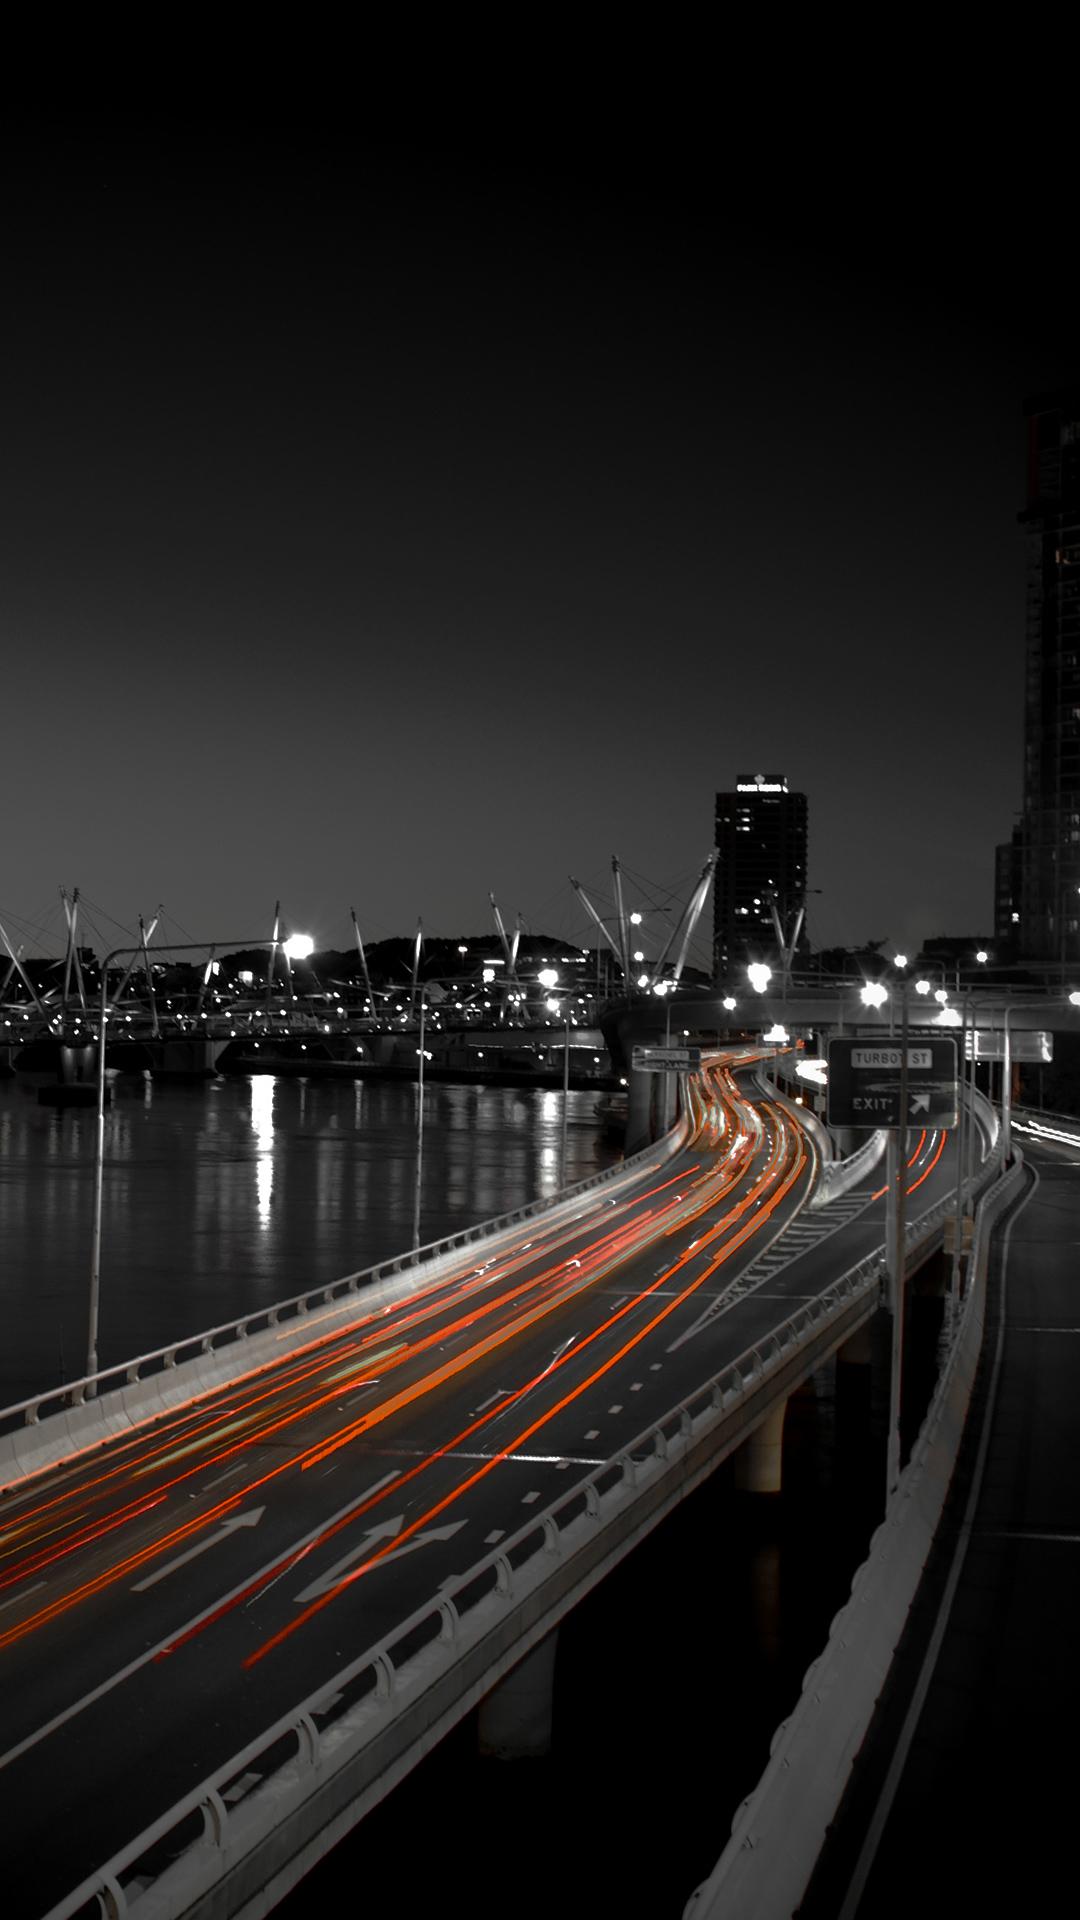 Hd wallpaper 1080x1920 - Dark City Light Road Amoled Wallpaper 1080x1920